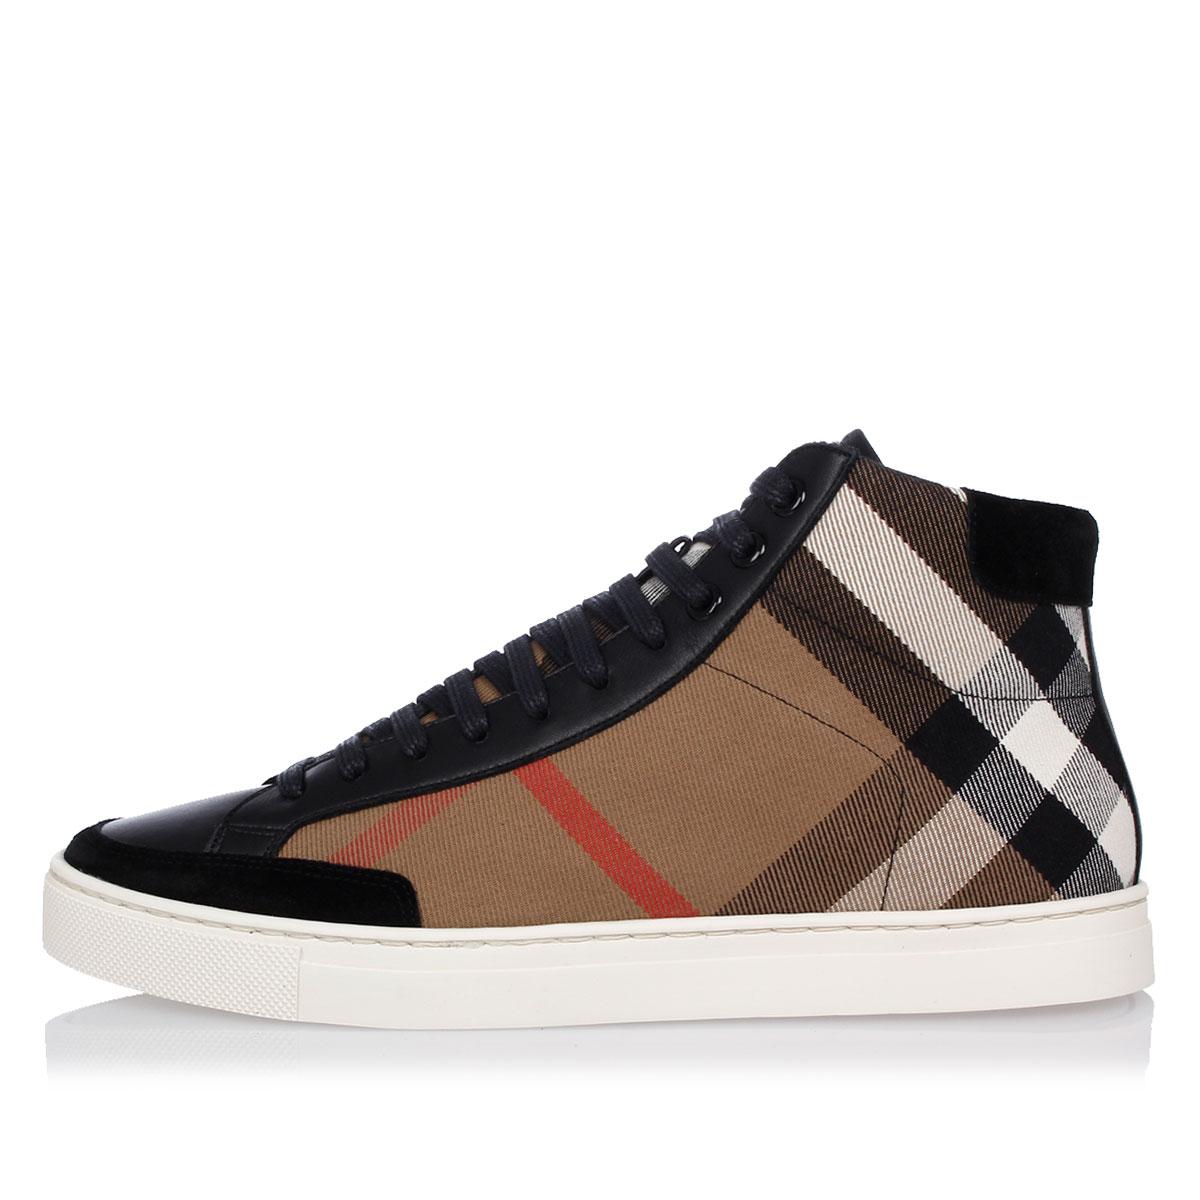 premium selection 2b310 59ff7 scarpe burberry uomo